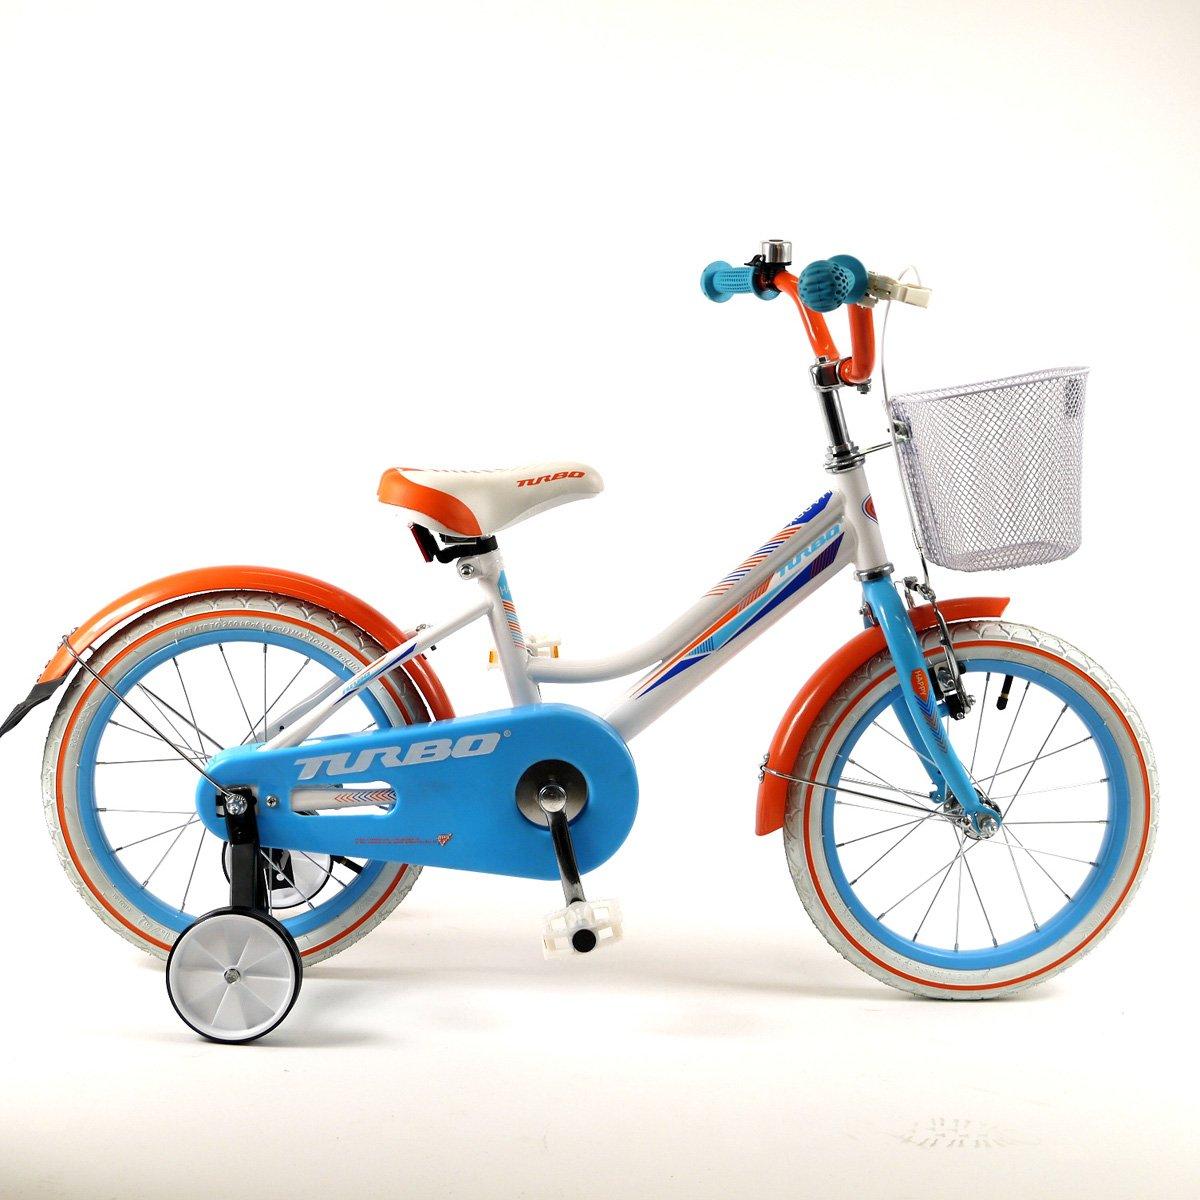 "16HAP-ORA Kinderfahrrad 16"" Zoll Kinderrad Bike Fahrrad Rad Bike Kinderrad Spielrad Kinder 07f2a2"